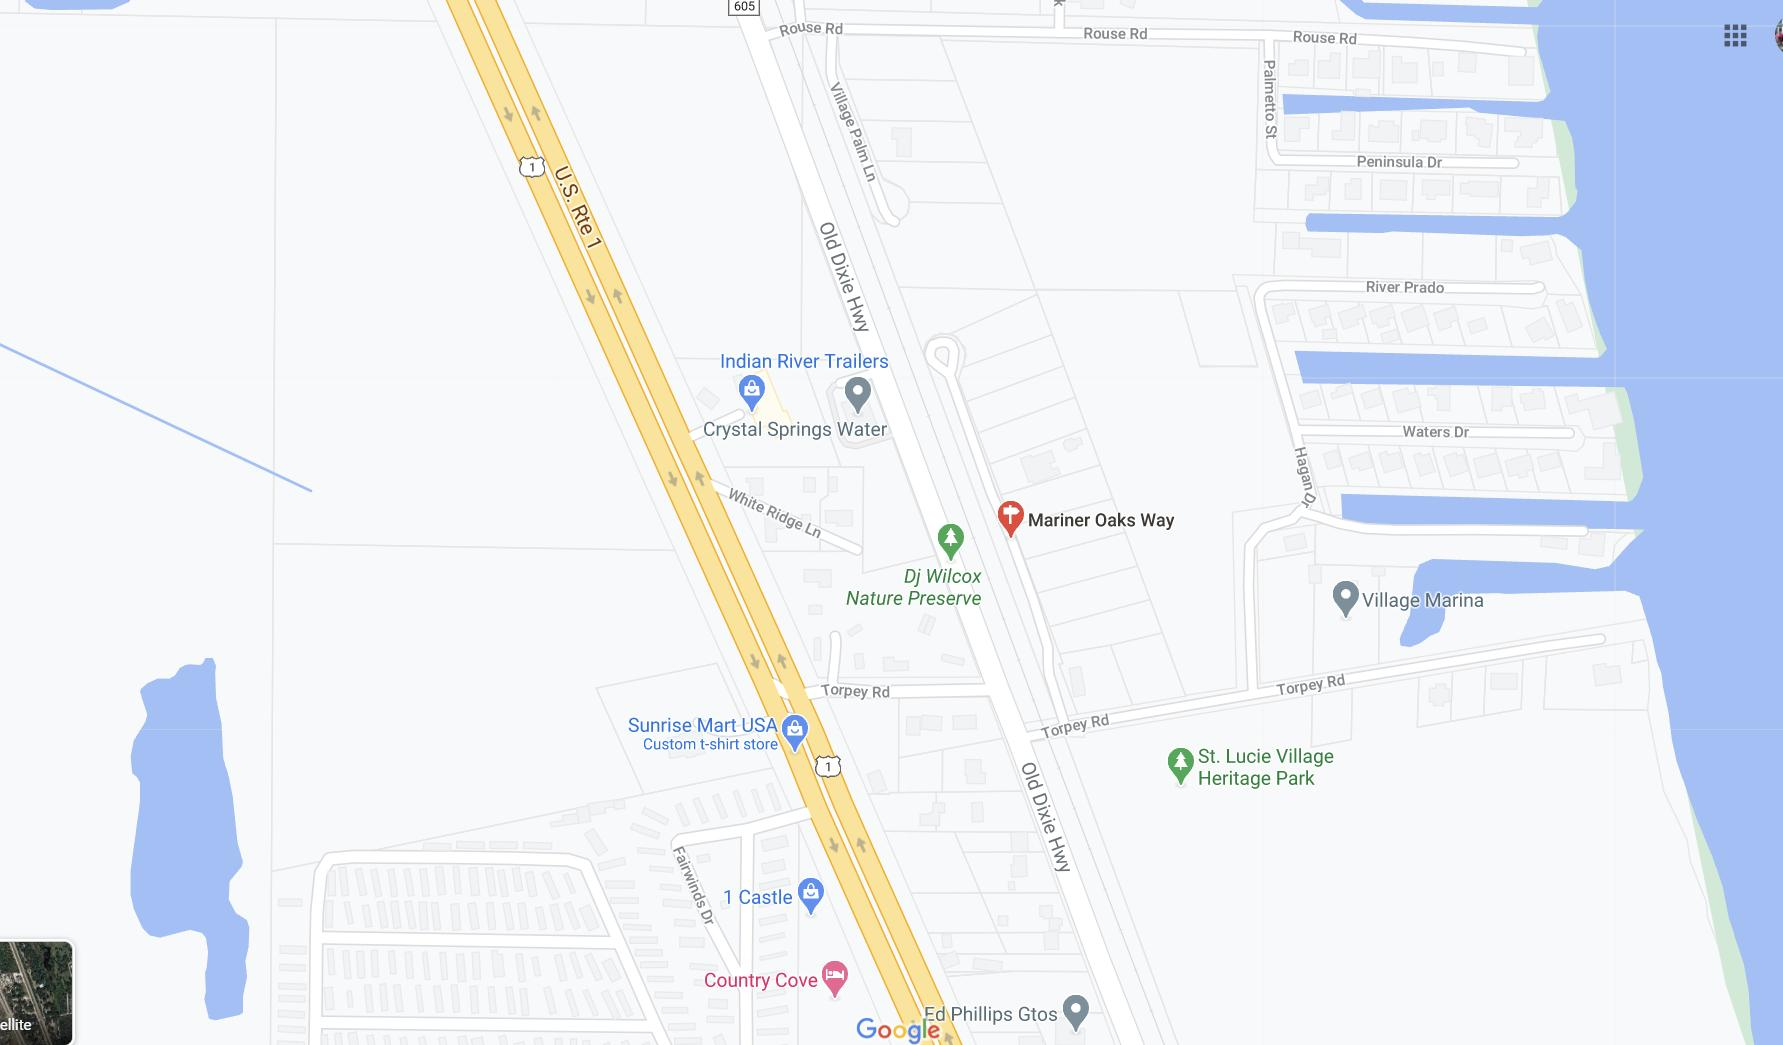 Mariner Oaks Way_FT Pierce 1